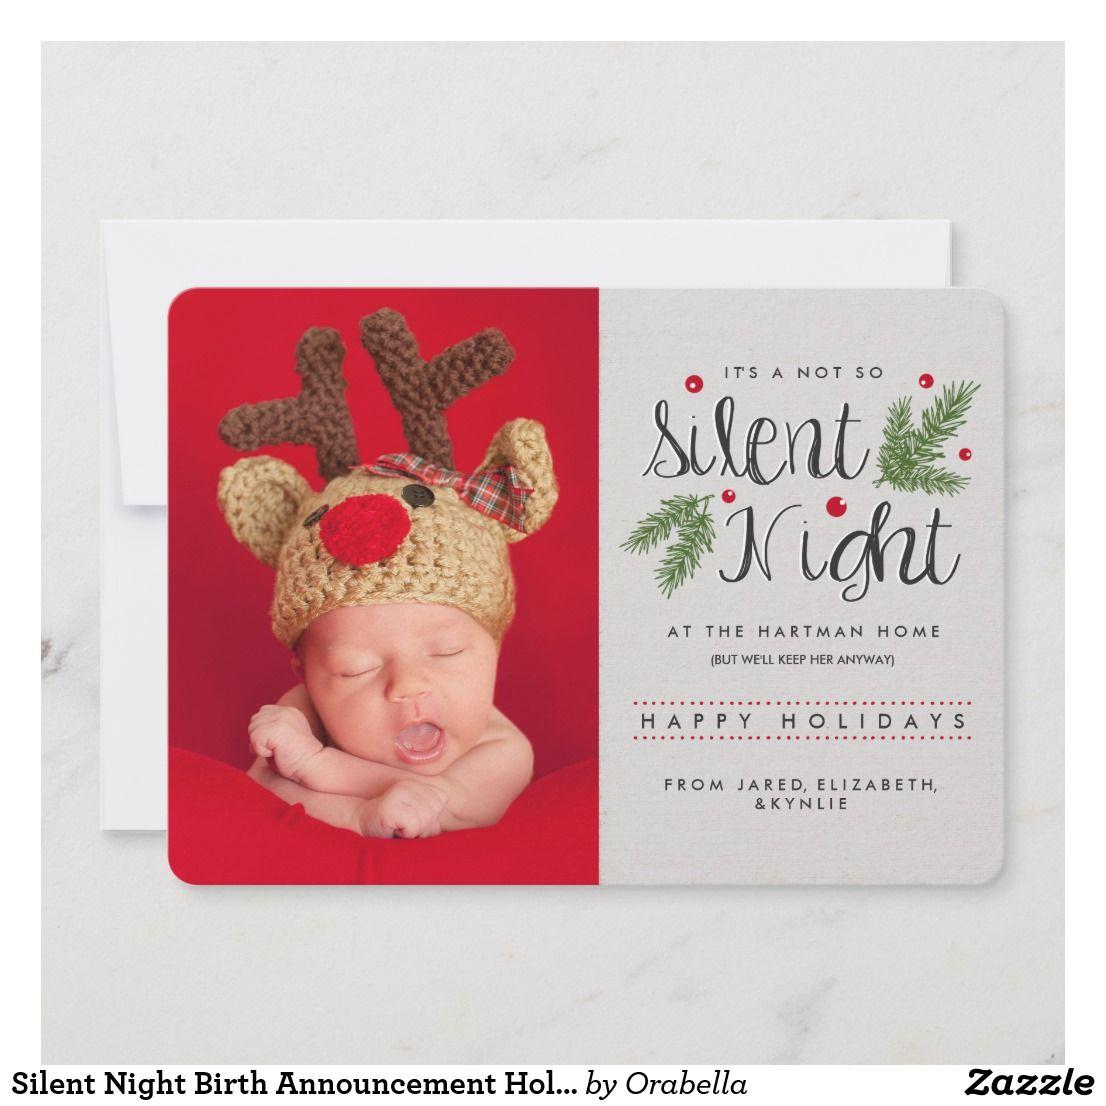 A Not So Silent Night Birth Announcement Photo Zazzle Com Birth Announcement Holiday Card Christmas Birth Announcement Holiday Photo Cards